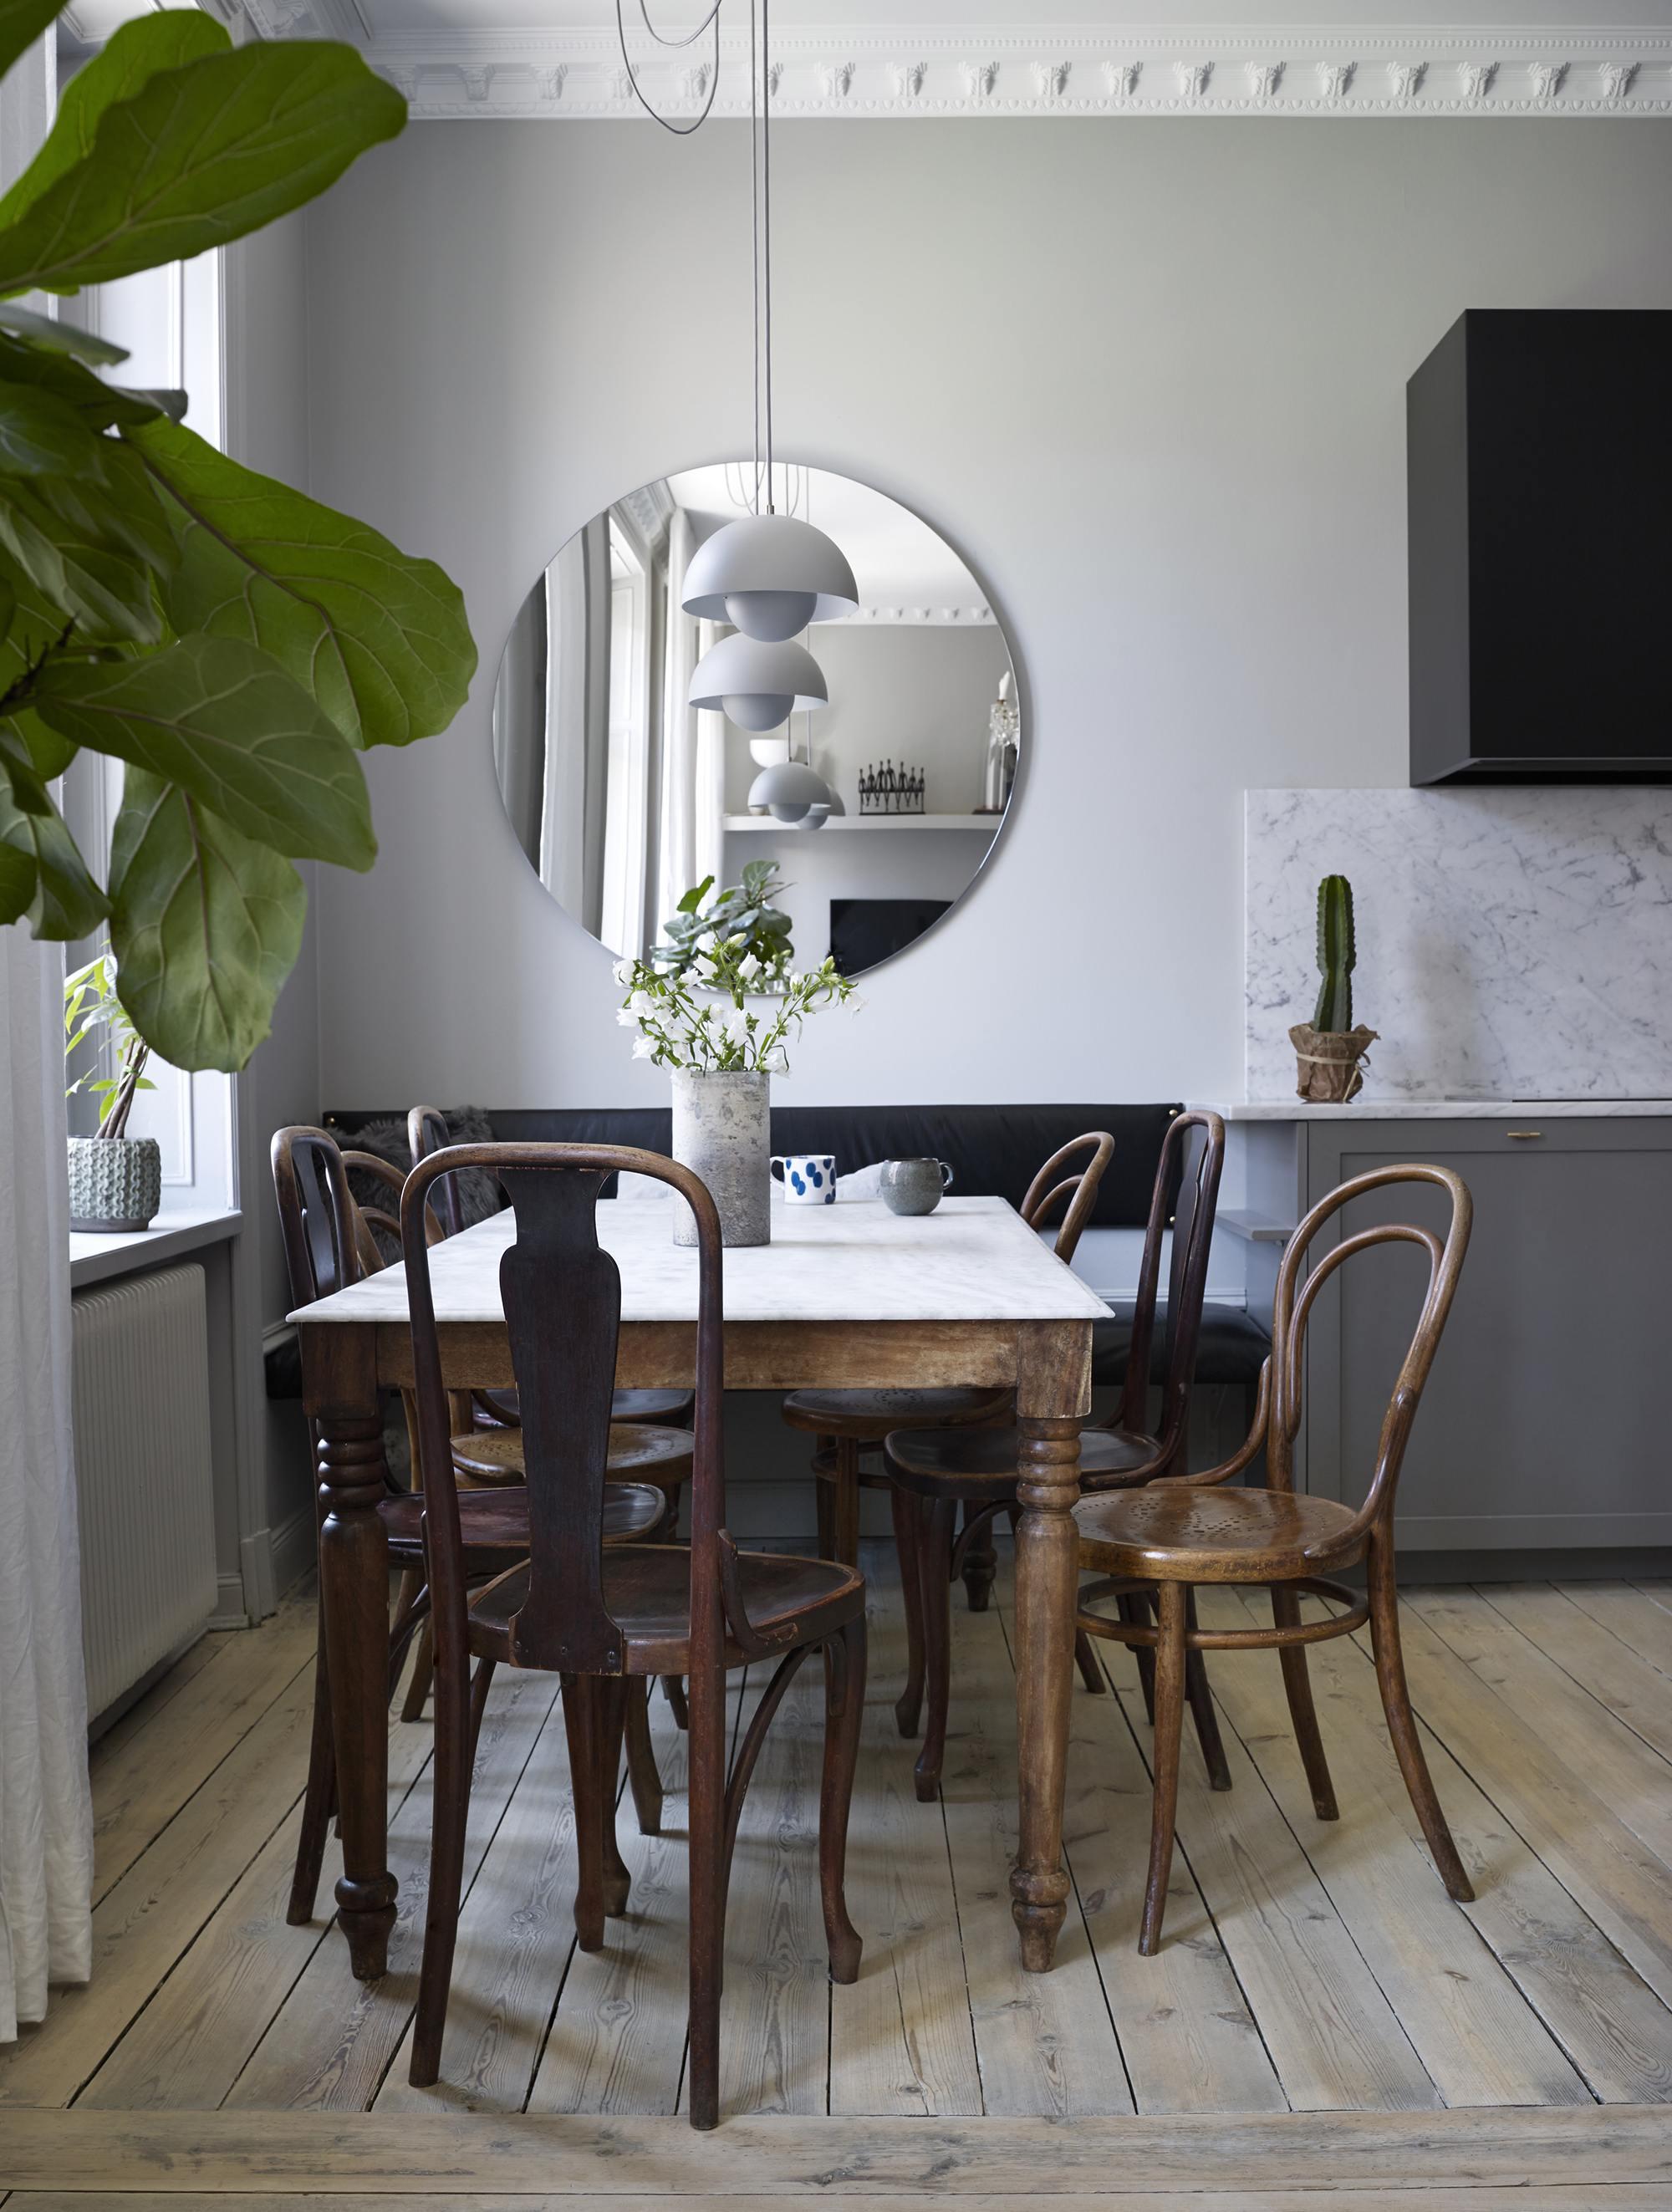 matbord-matrum-kok-vardagsrum-oppenplanlosning-stolar